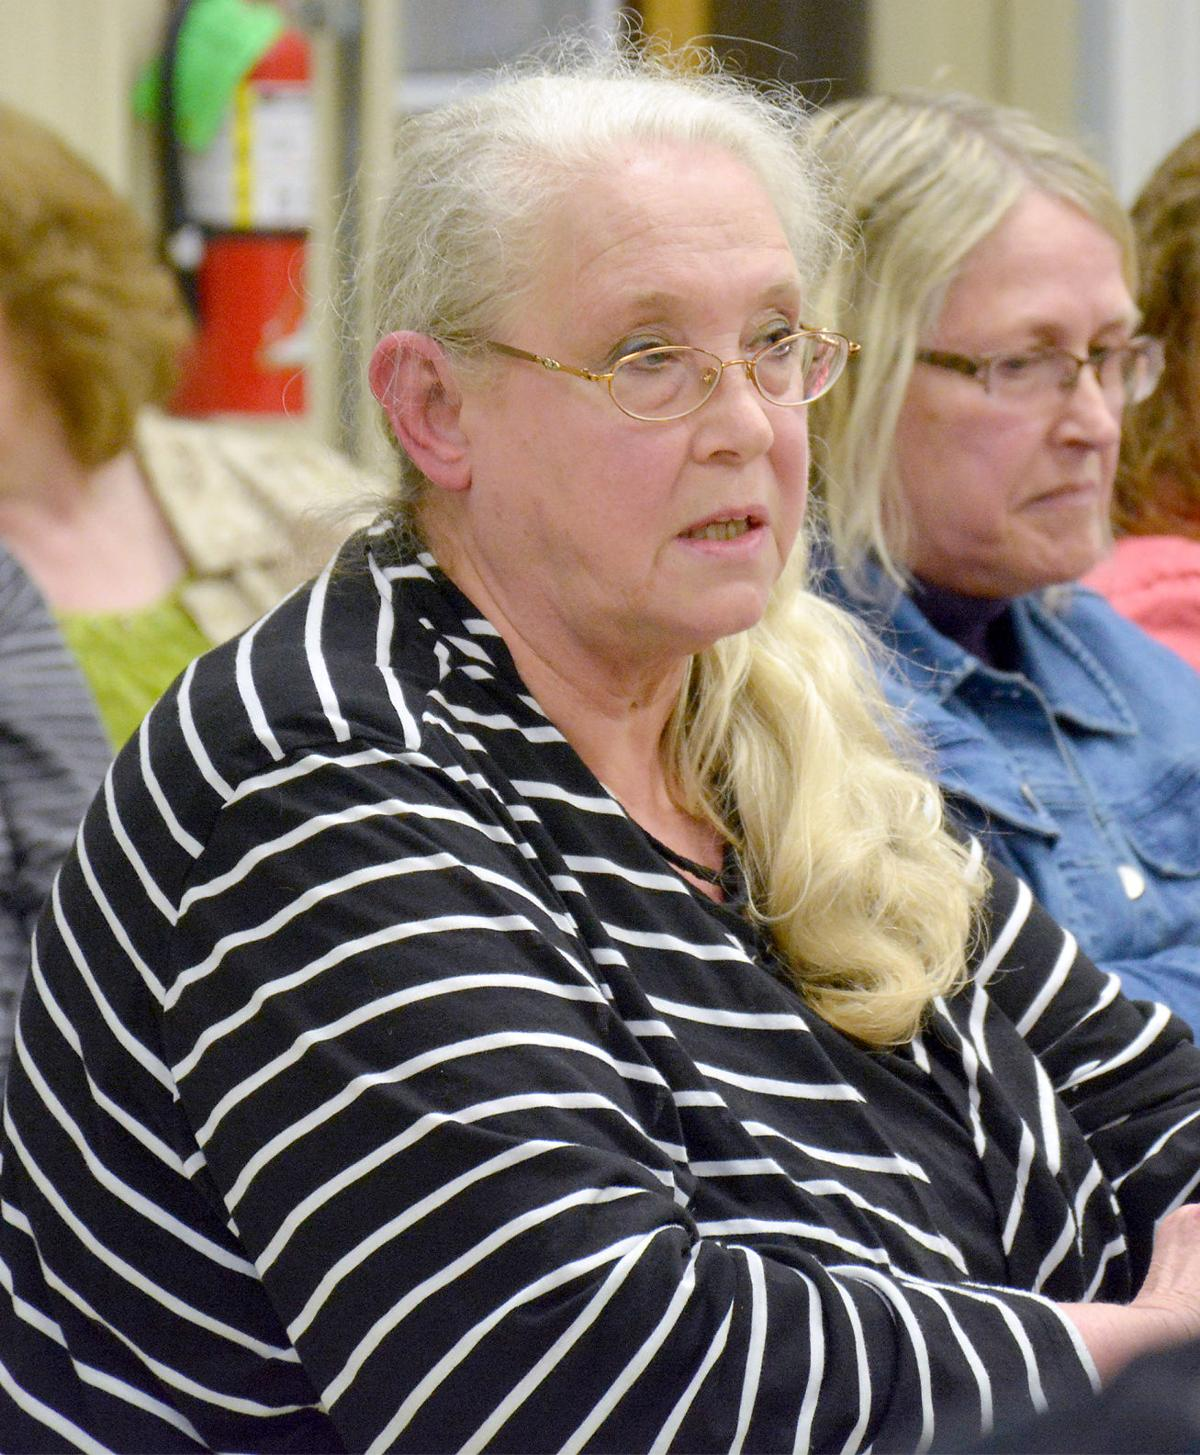 County board passes separation referendum